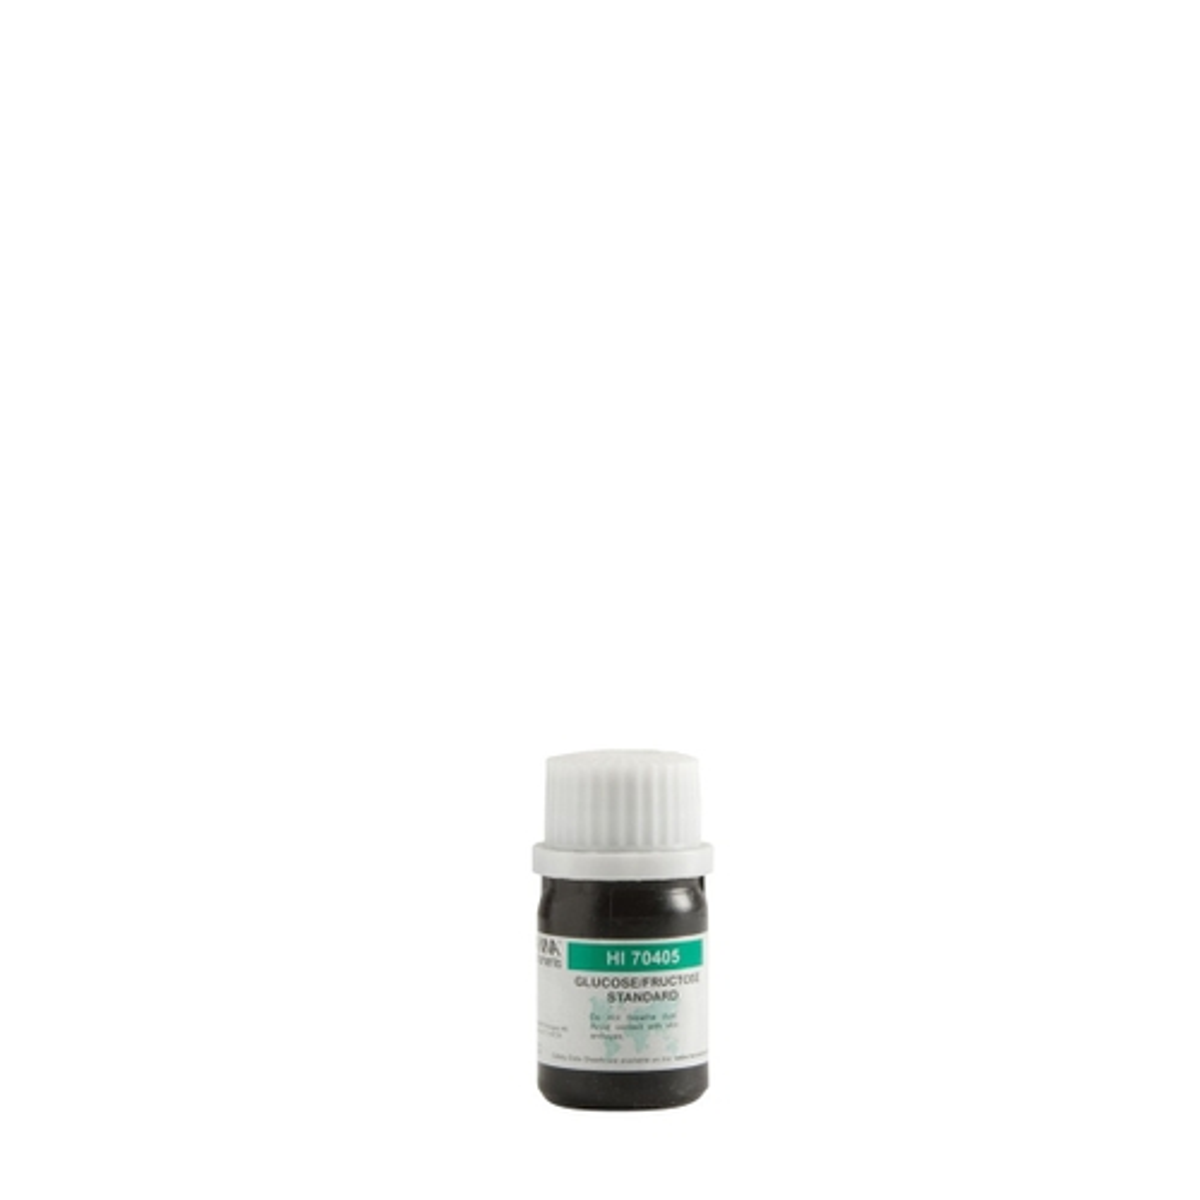 Reagente standard Glucosio/Fruttosio, 20 g - HI70405